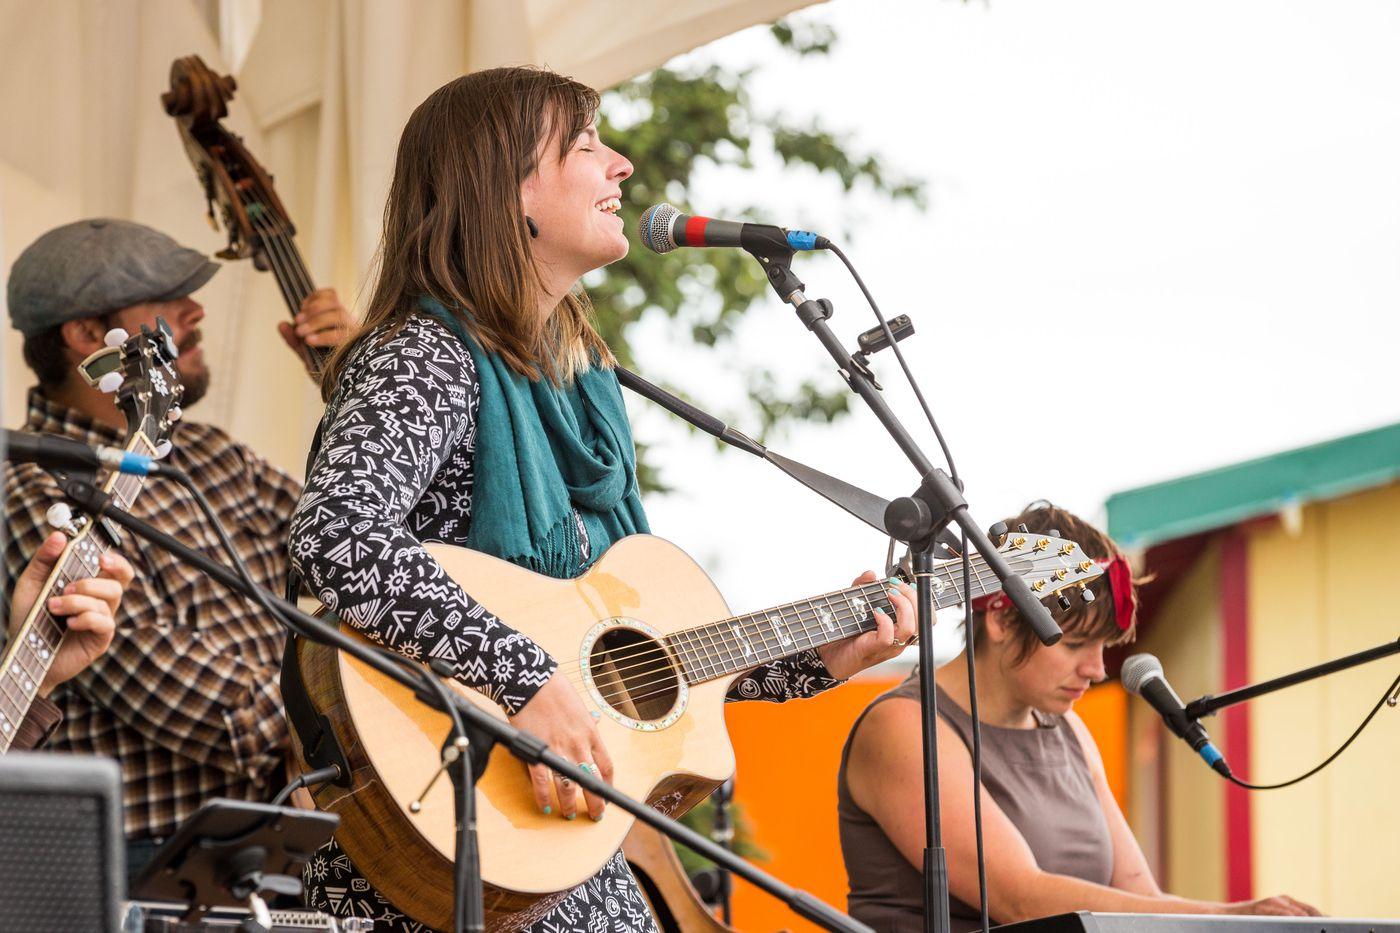 Singer-songwriter Emma Hill performs at Salmonstock on Sunday morning, August 3, 2014. (Loren Holmes / Alaska Dispatch News)